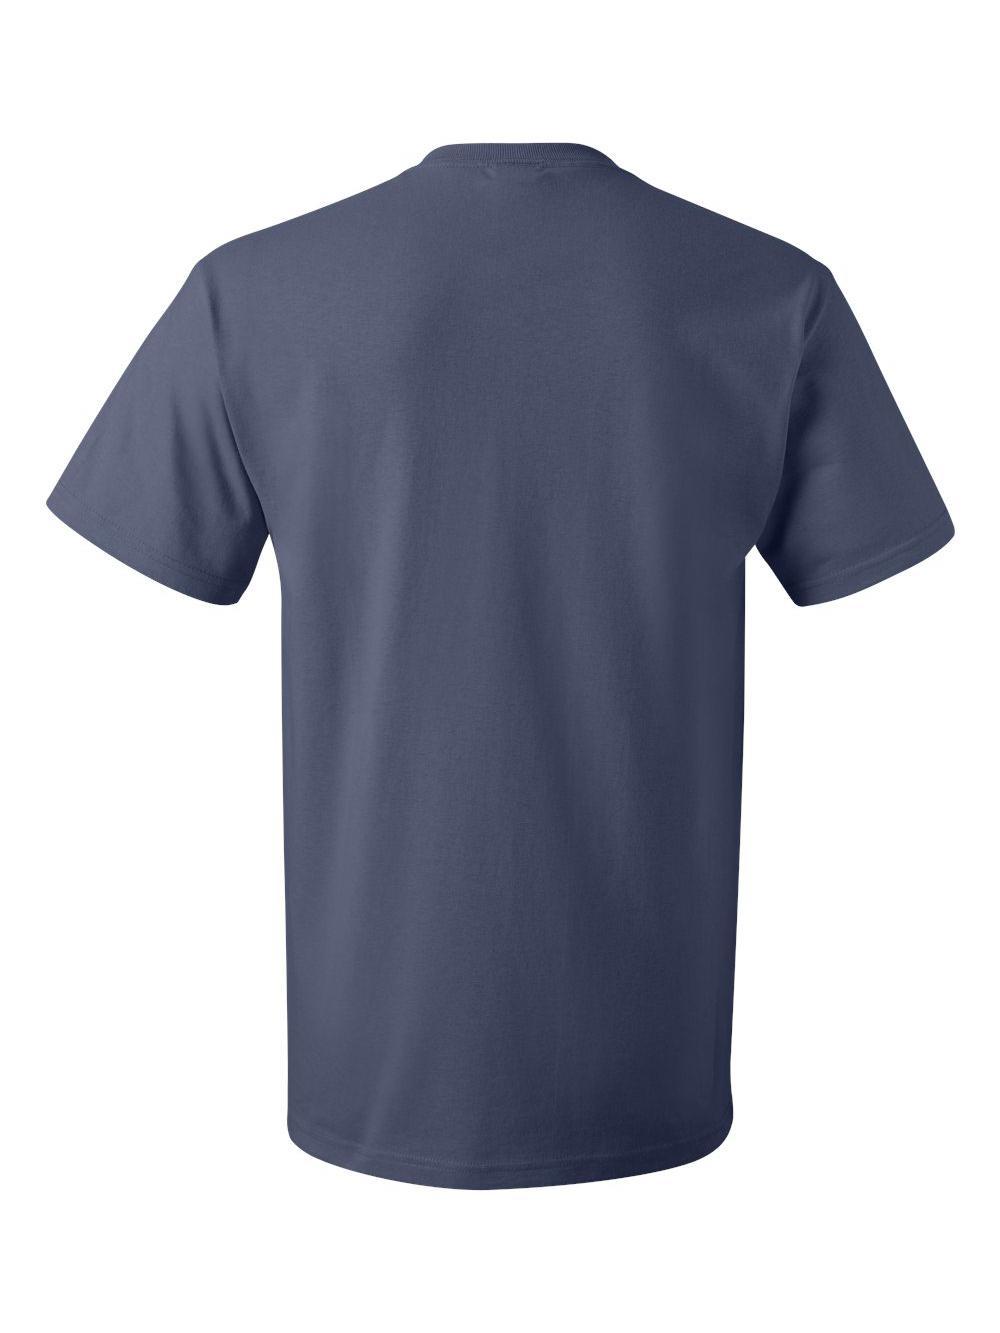 Fruit-of-the-Loom-HD-Cotton-Short-Sleeve-T-Shirt-3930R thumbnail 49